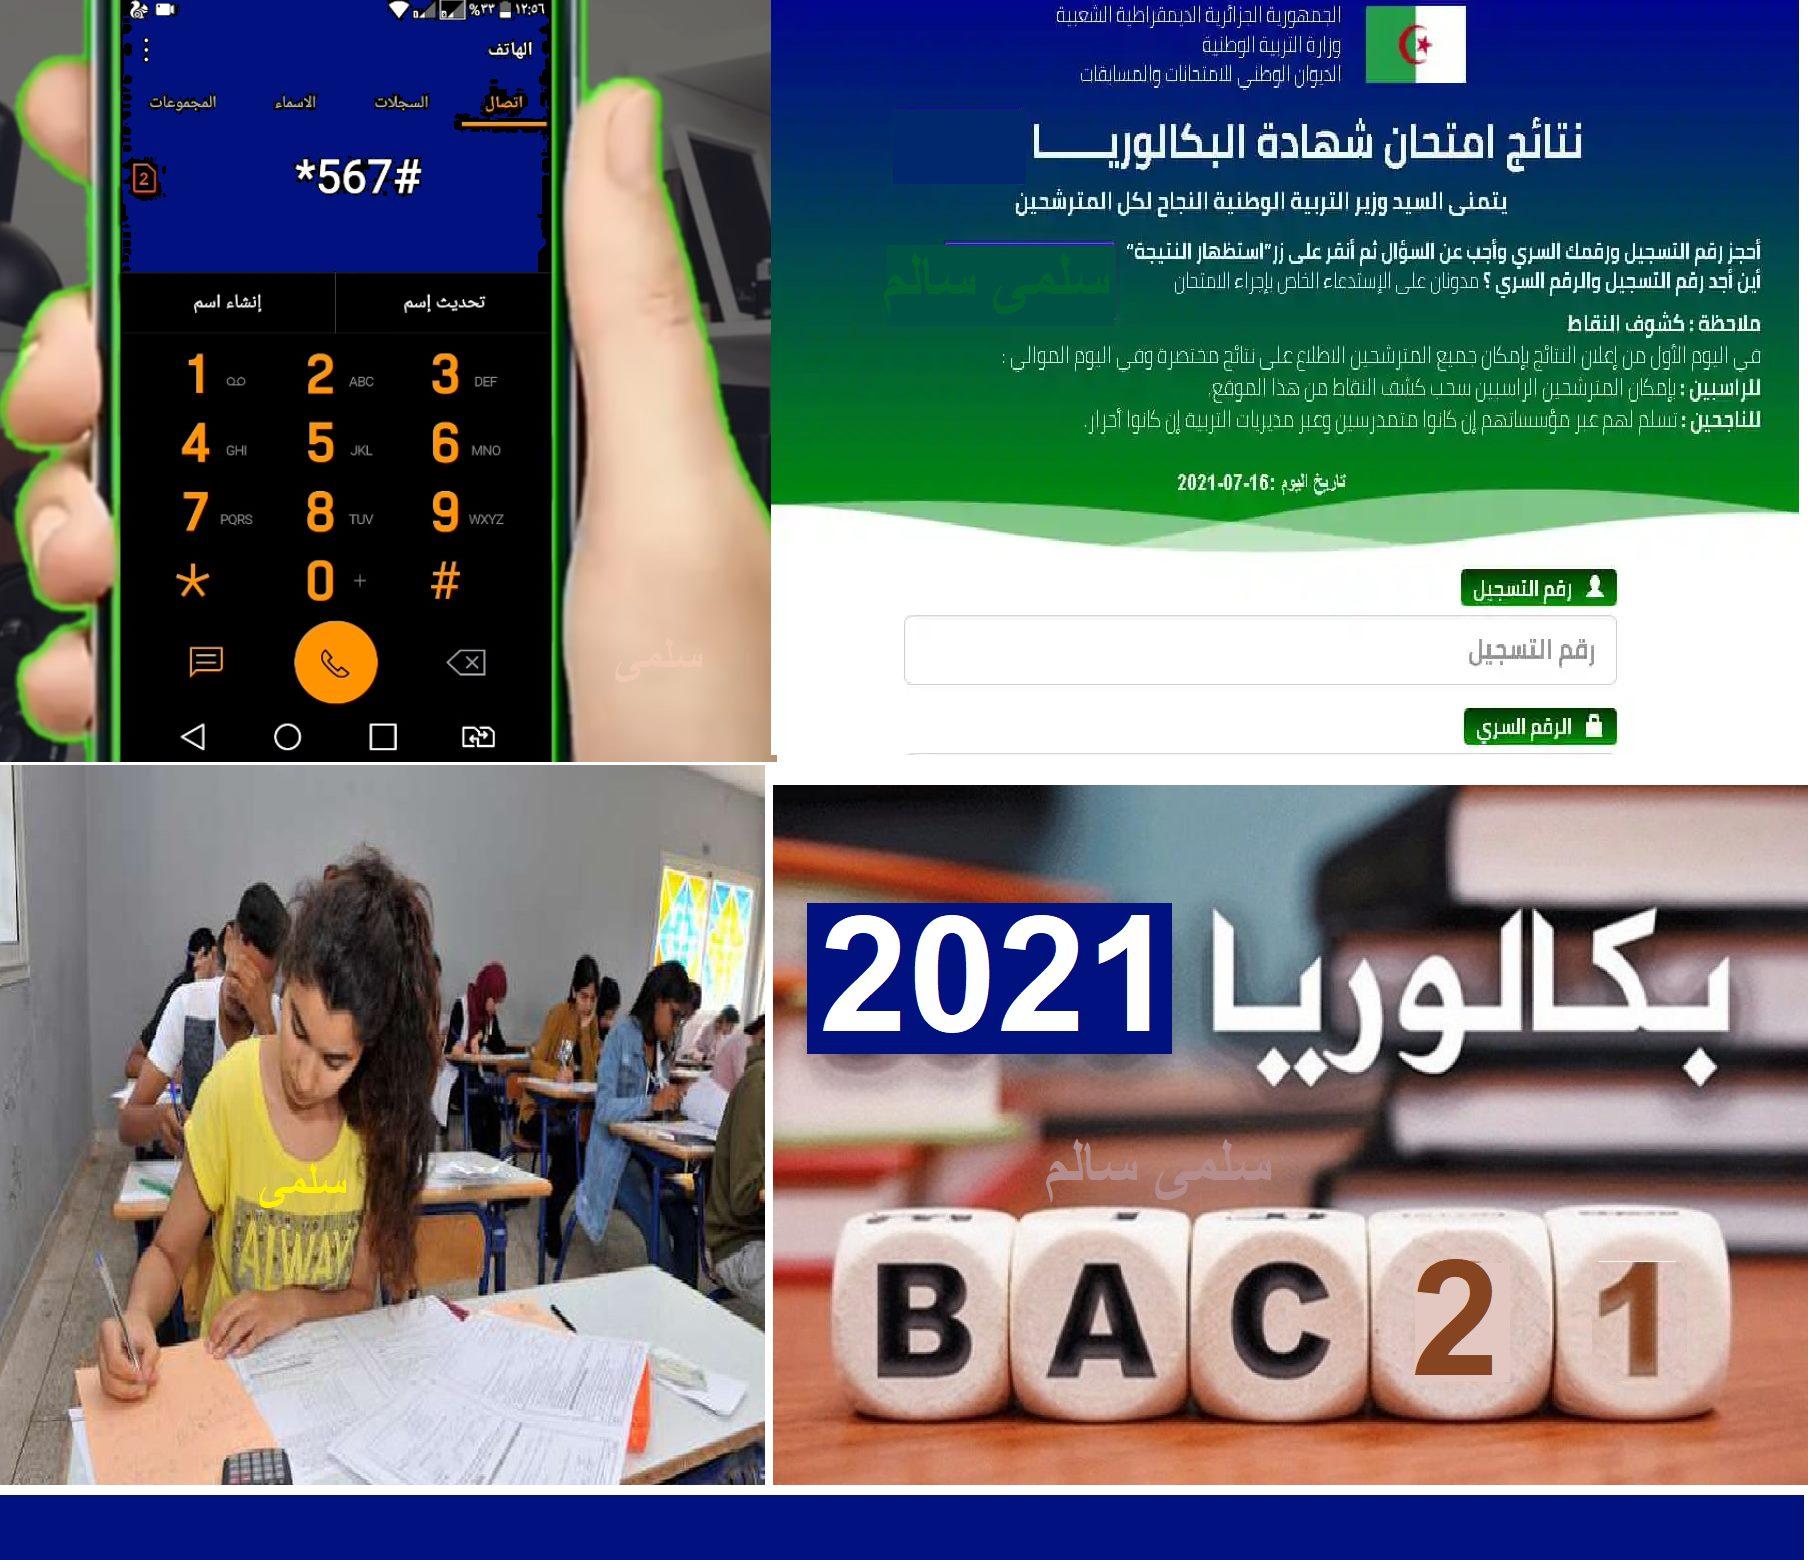 bac.onec.dz resultat موقع نتائج شهادة البكالوريا 2021 بالهاتف النقال ورابط الديوان الوطني